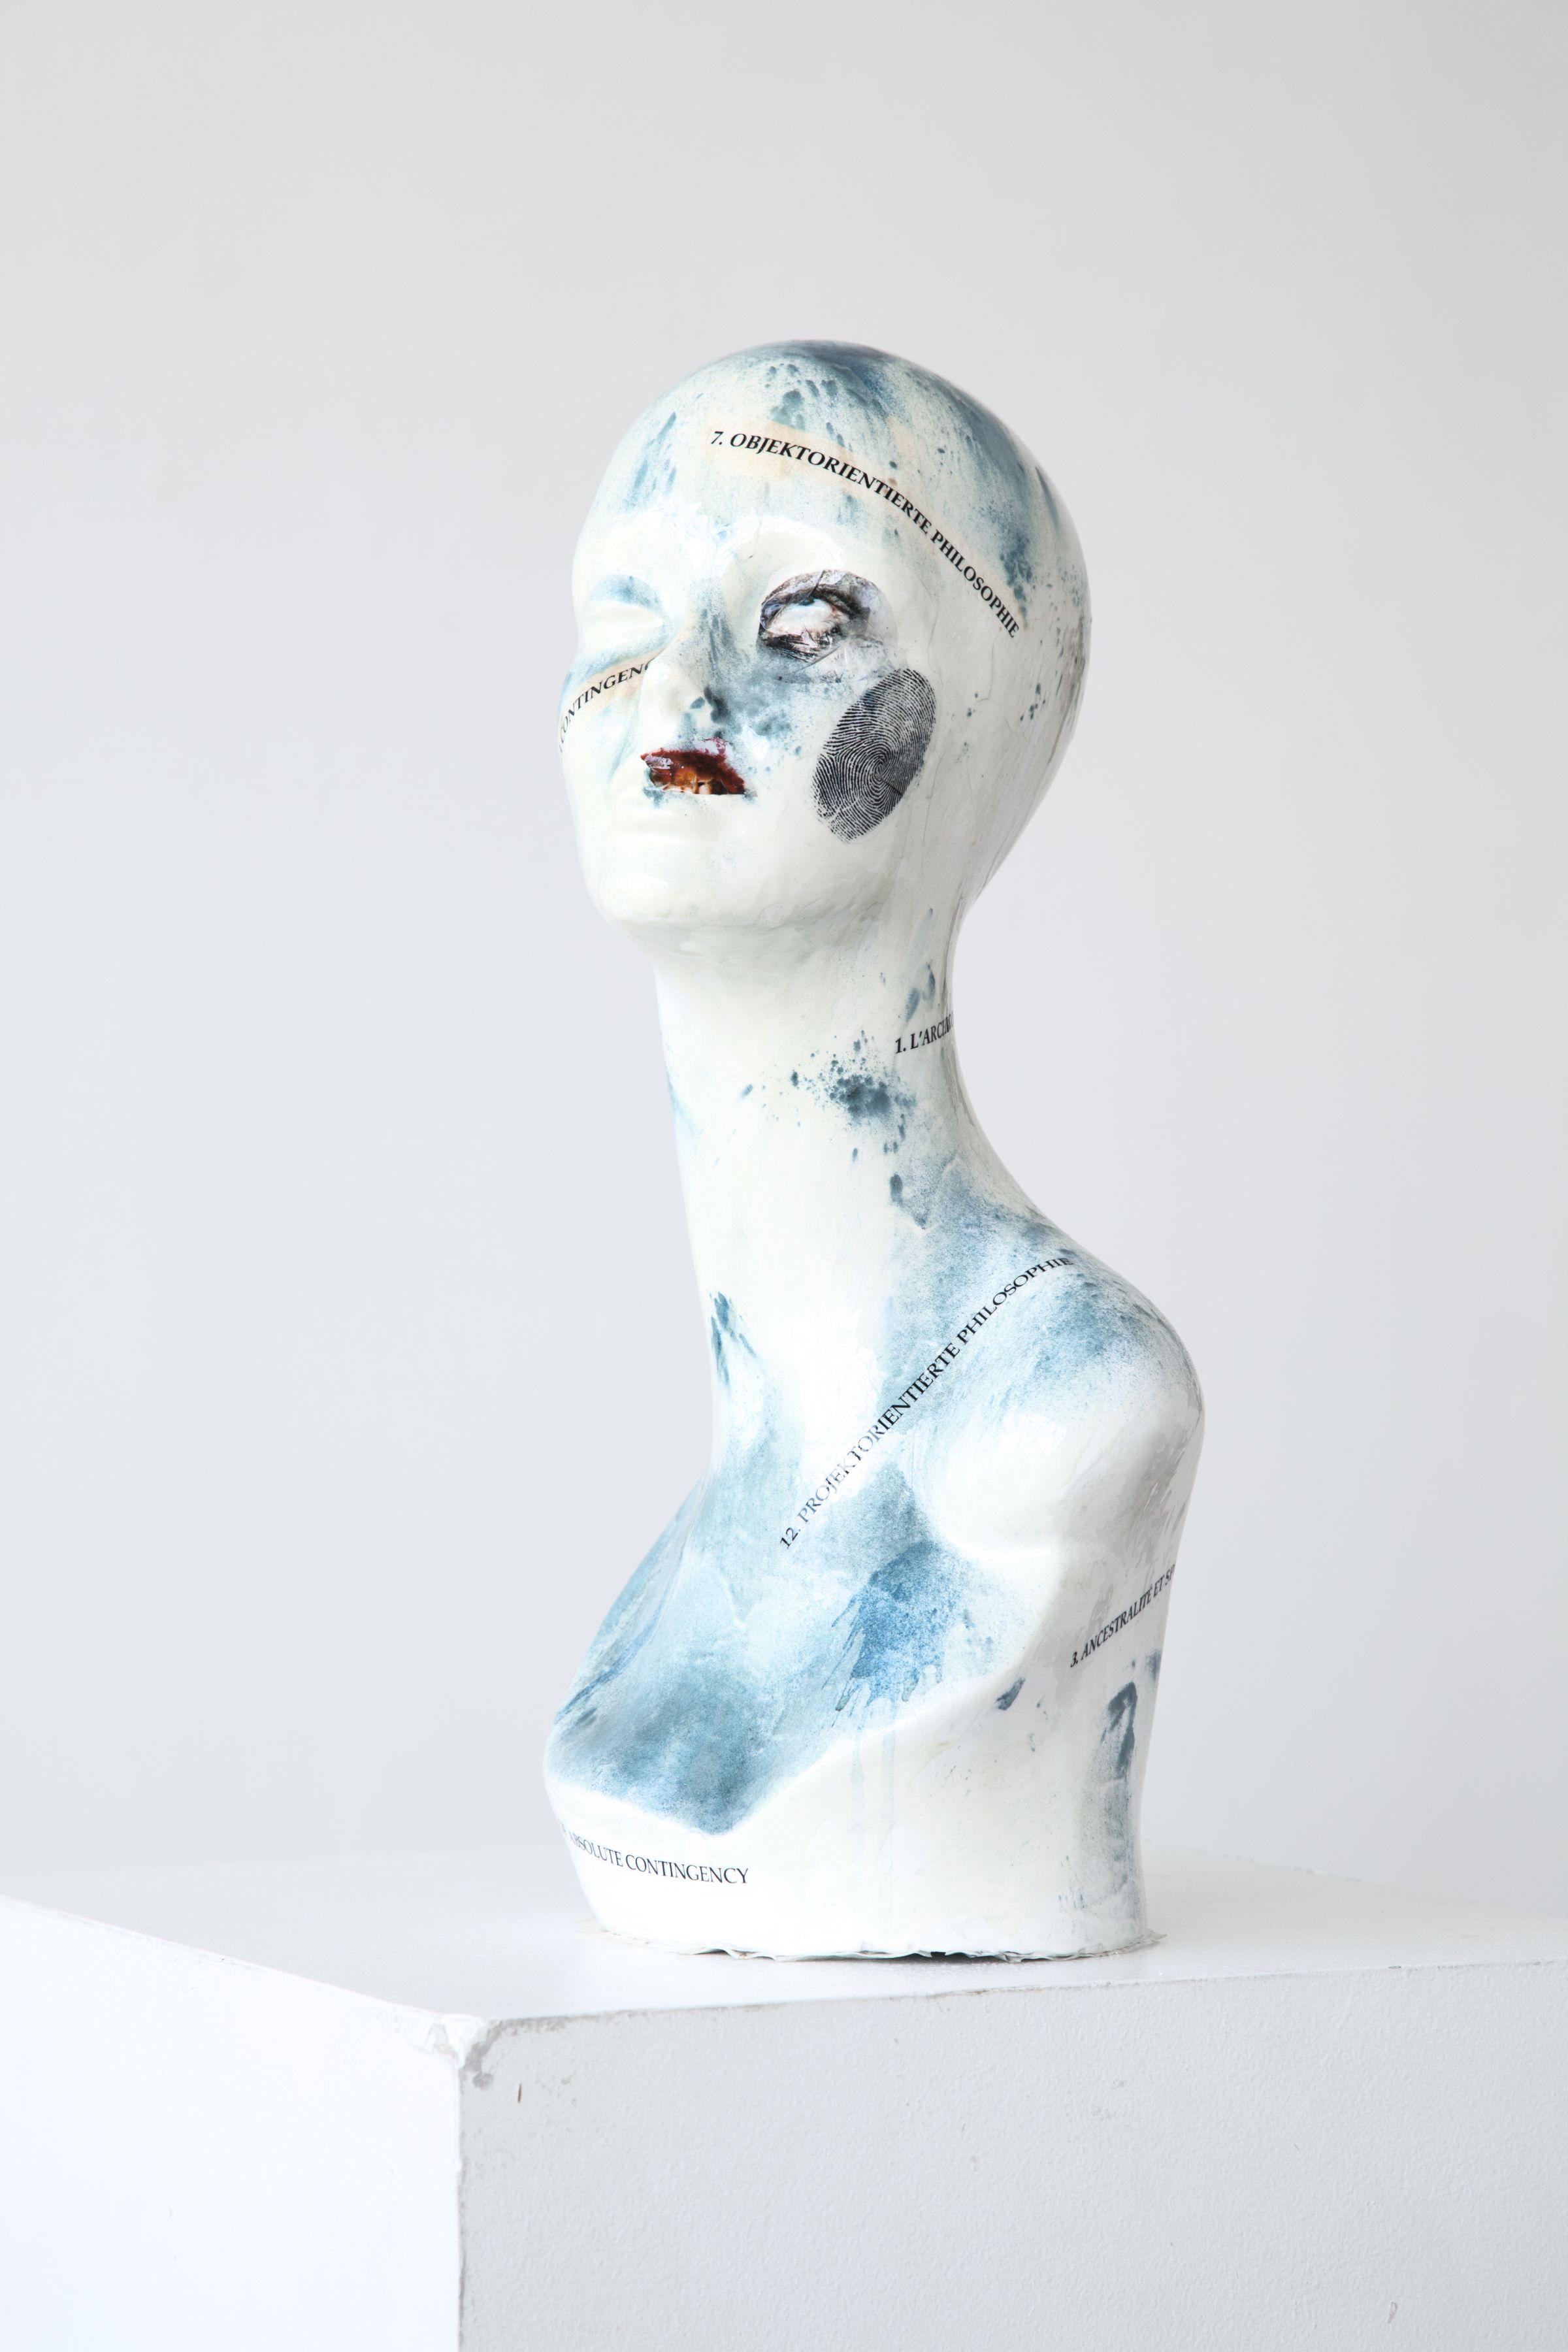 Mathieu Malouf  Slave (Object-Oriented Philosophy), 2012  Decals, enamel, spirulina powder, epoxy resin on heads  19 x 8 1/2 x 8 1/4 inches (48.3 x 21.6 x 21 cm)